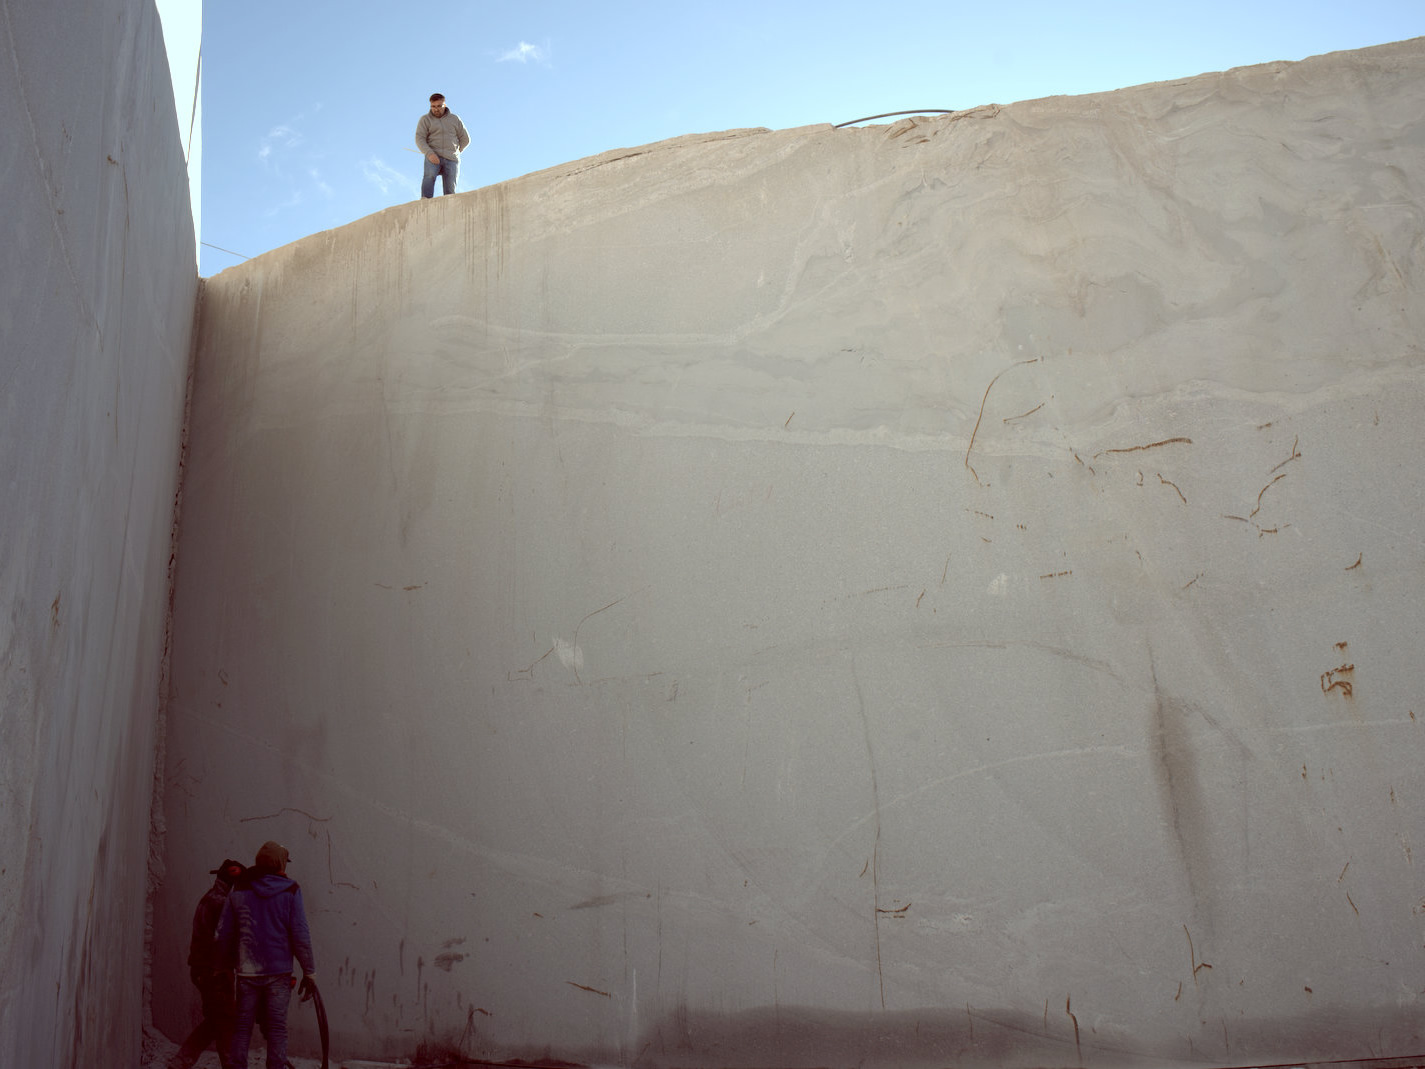 Granitos Irmãos Peixoto - carrière Lapa - extraction de granit